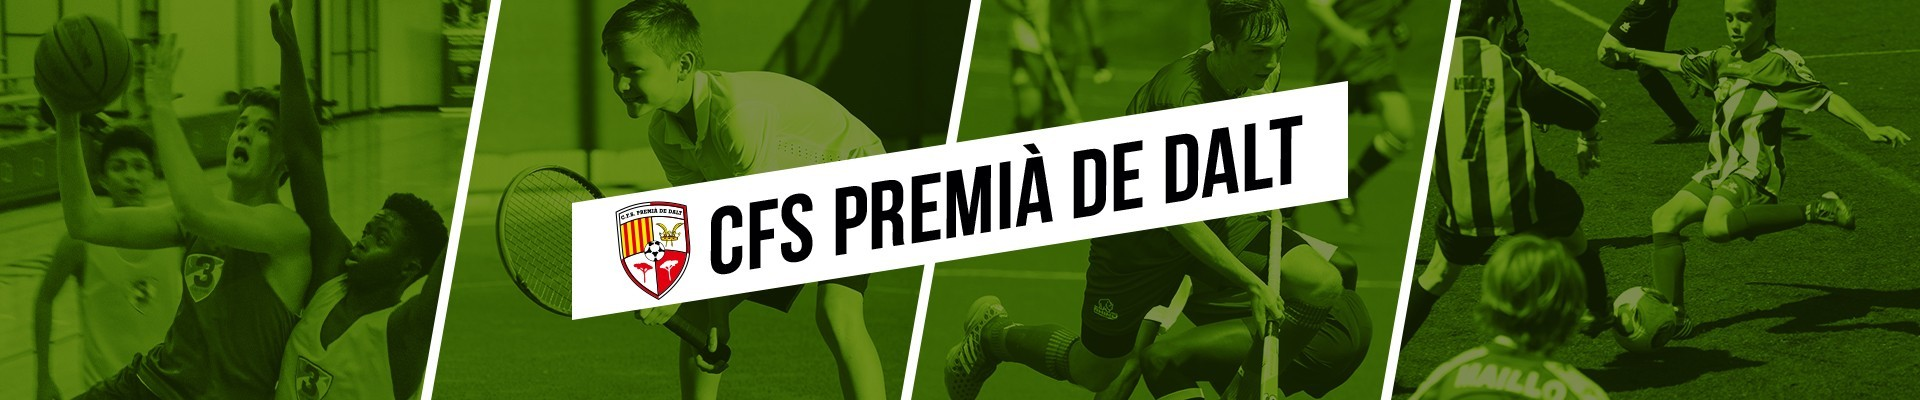 CFS PREMIA DE DALT